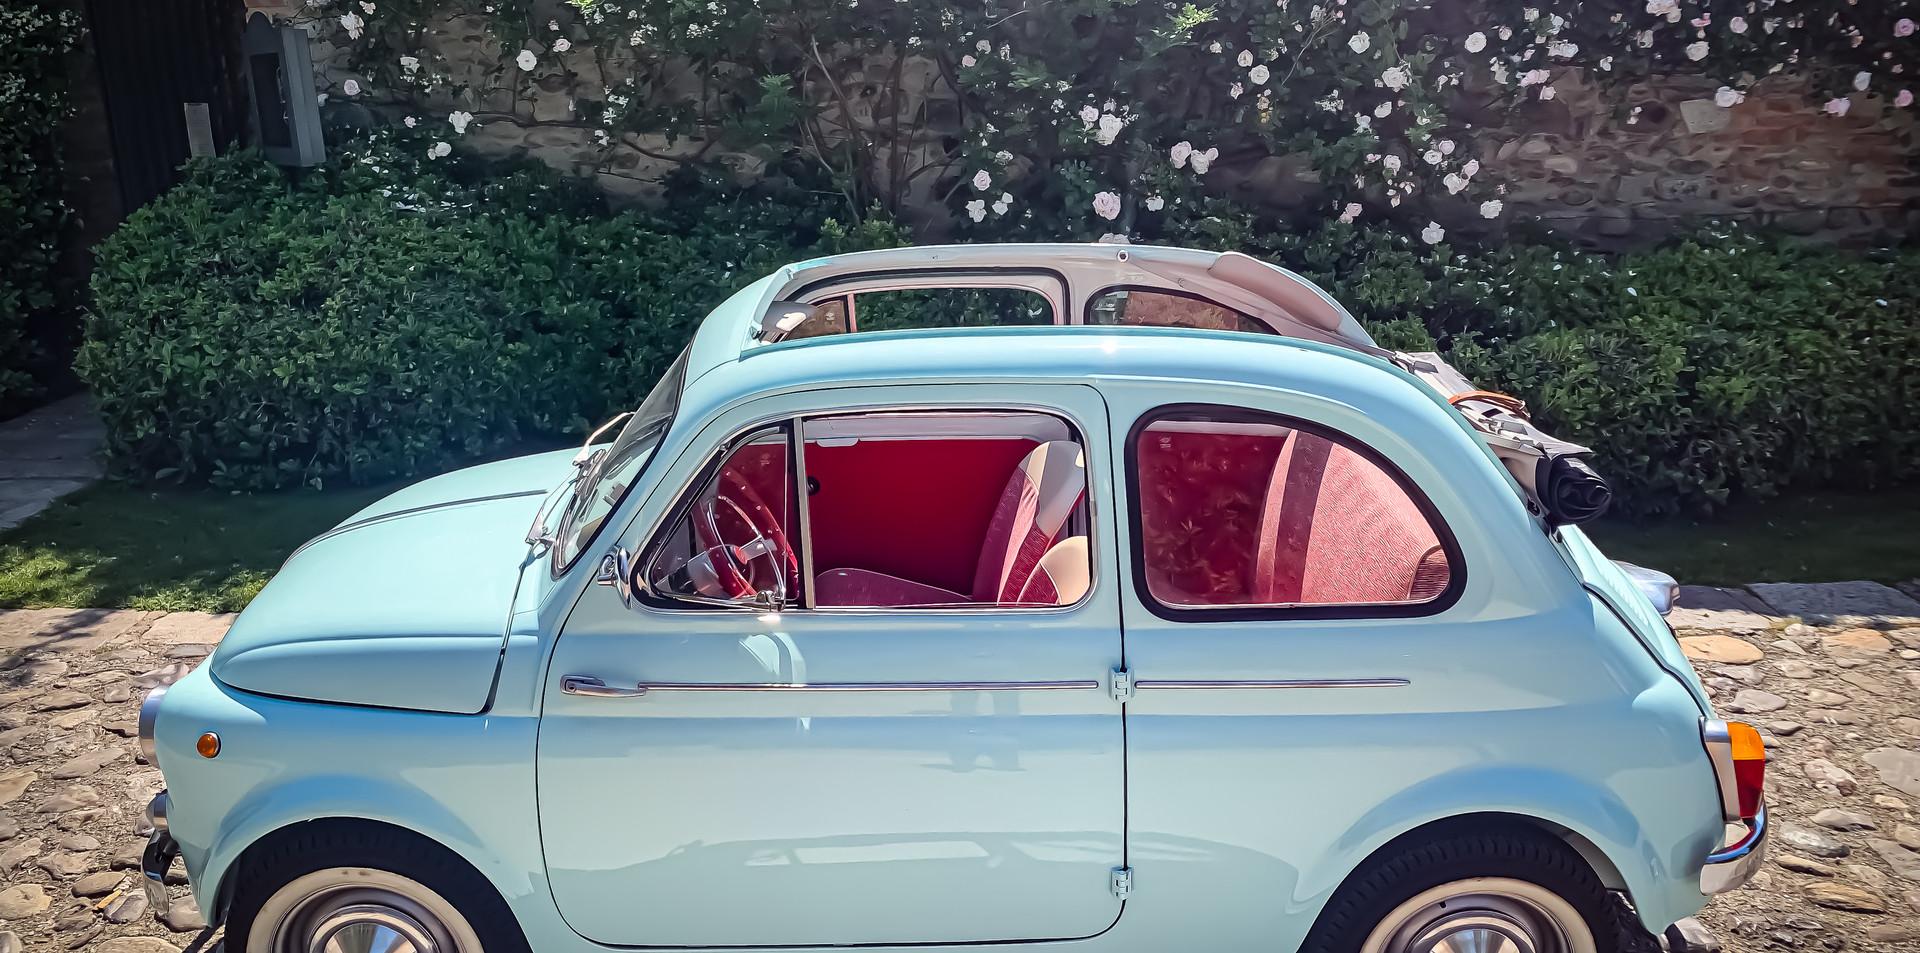 Fiat 500 D Cabrio 1956 Noleggio Auto Epo